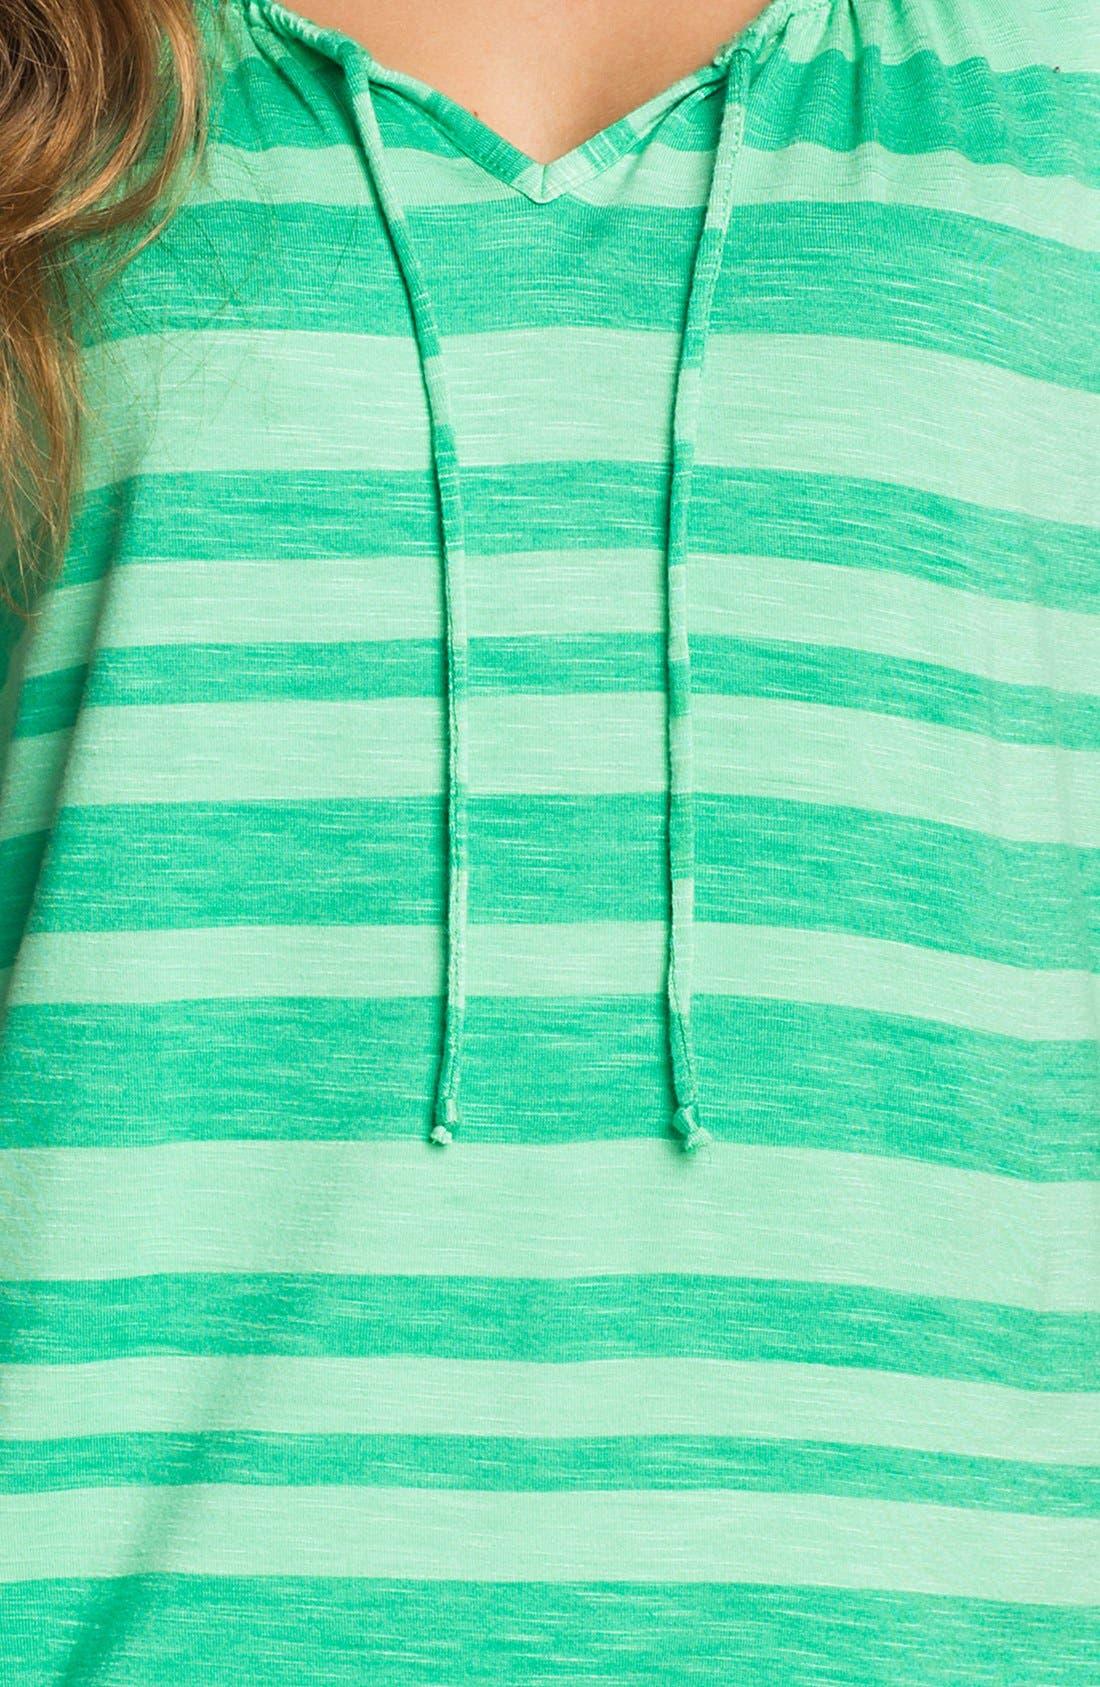 Alternate Image 3  - Amber Sun 'Reese' Tie Neck Tee